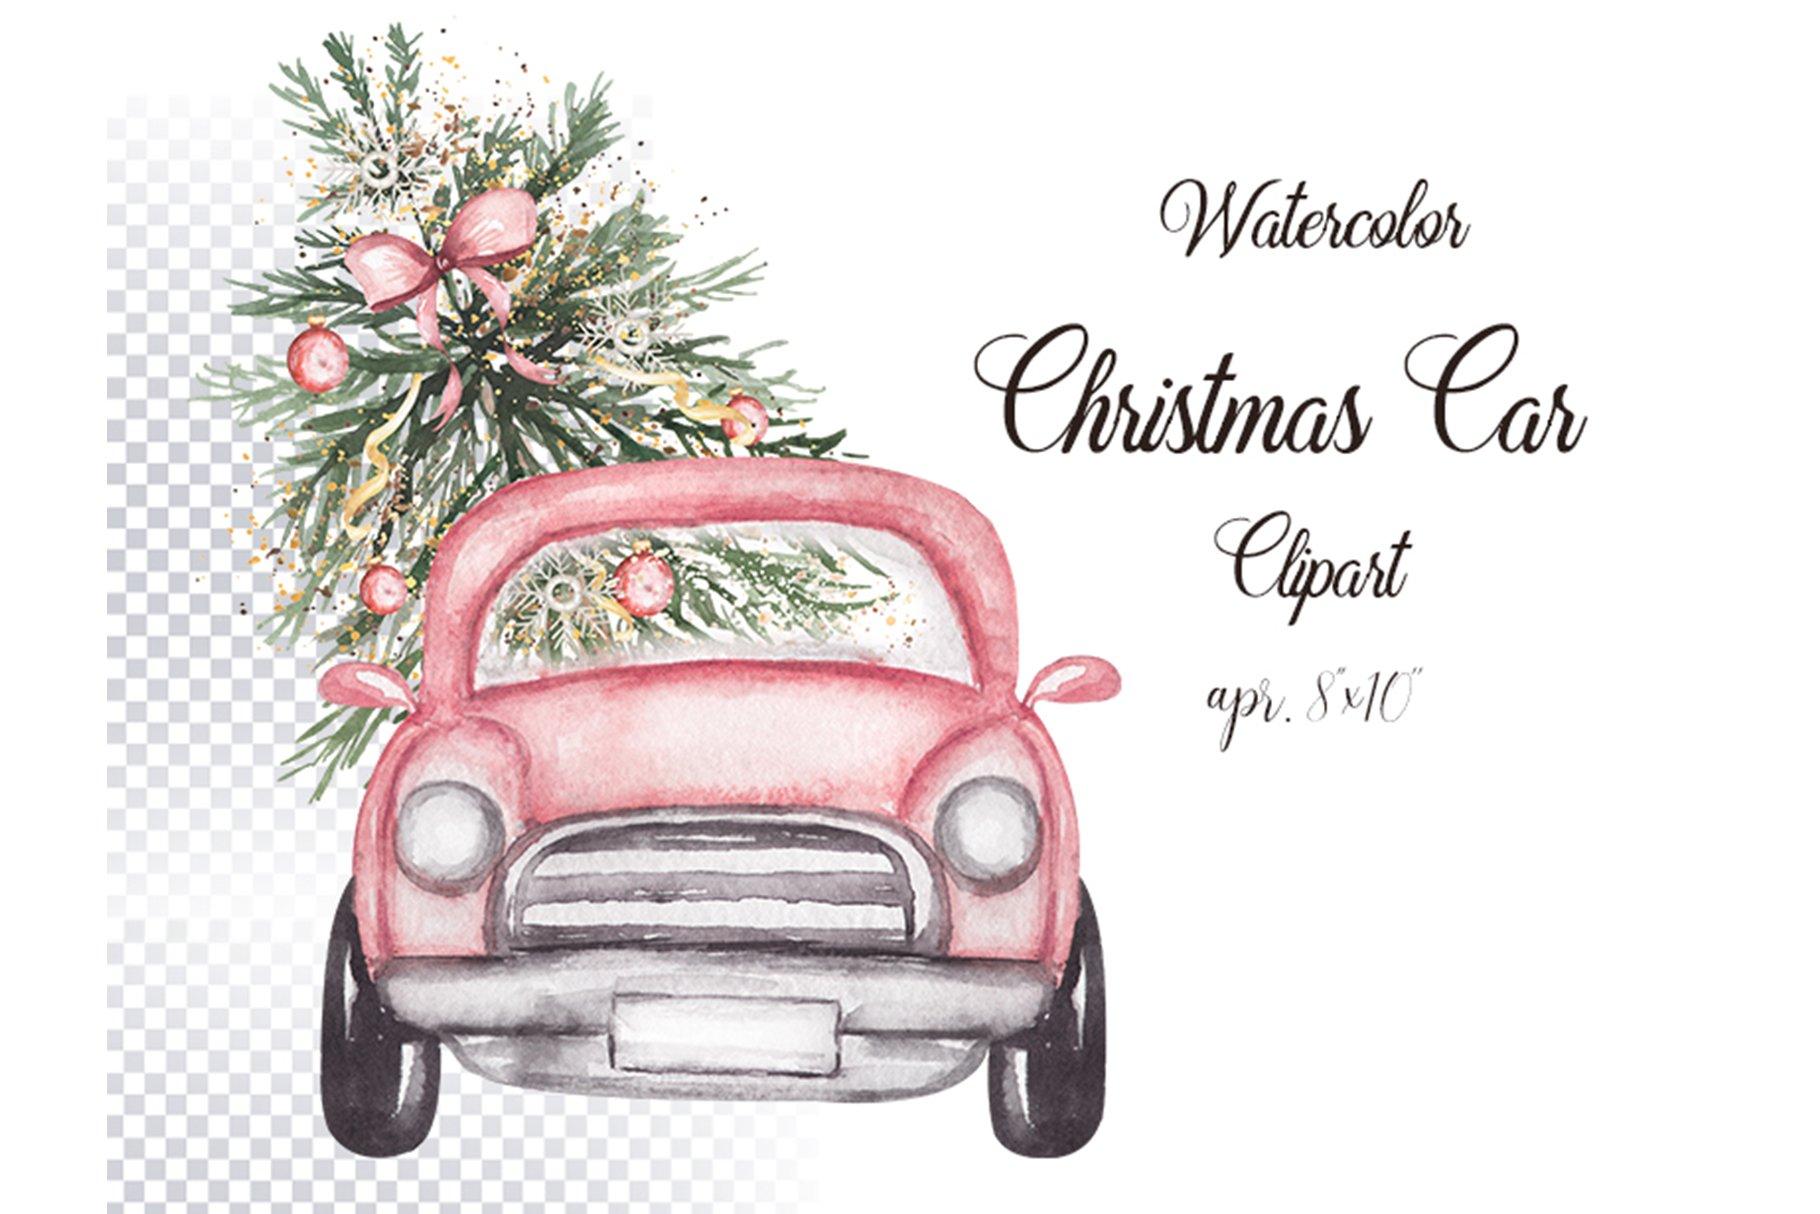 Download Watercolor Christmas Car Illustration 1092142 Illustrations Design Bundles